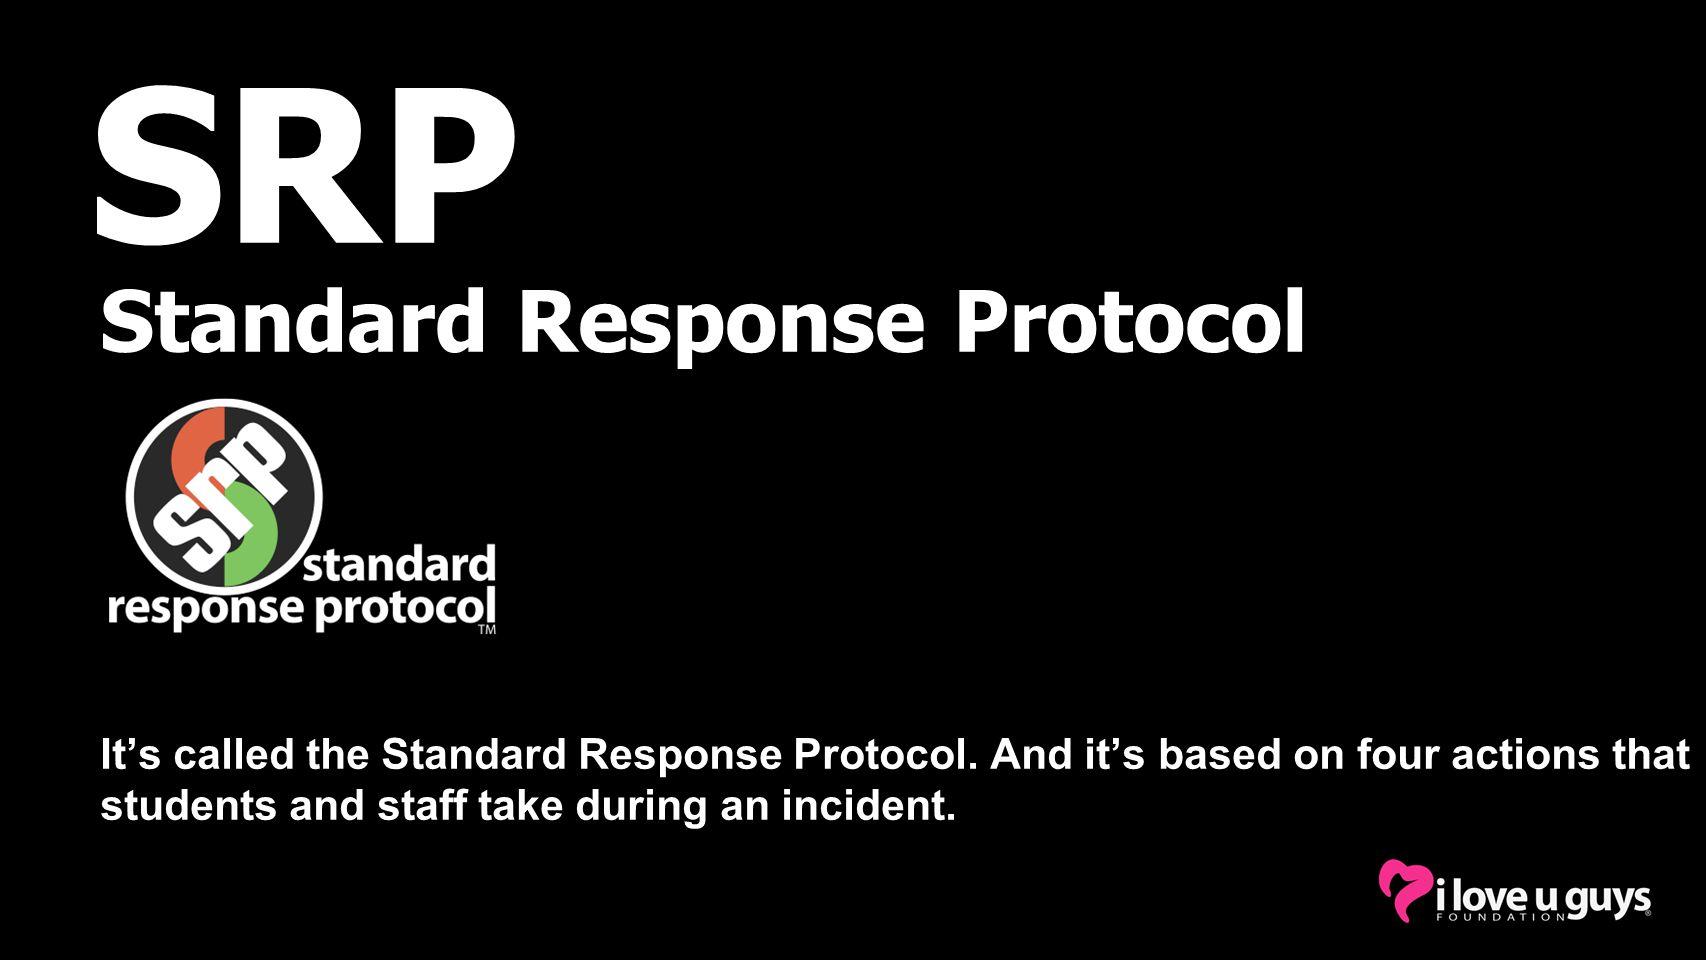 SRP Standard Response Protocol